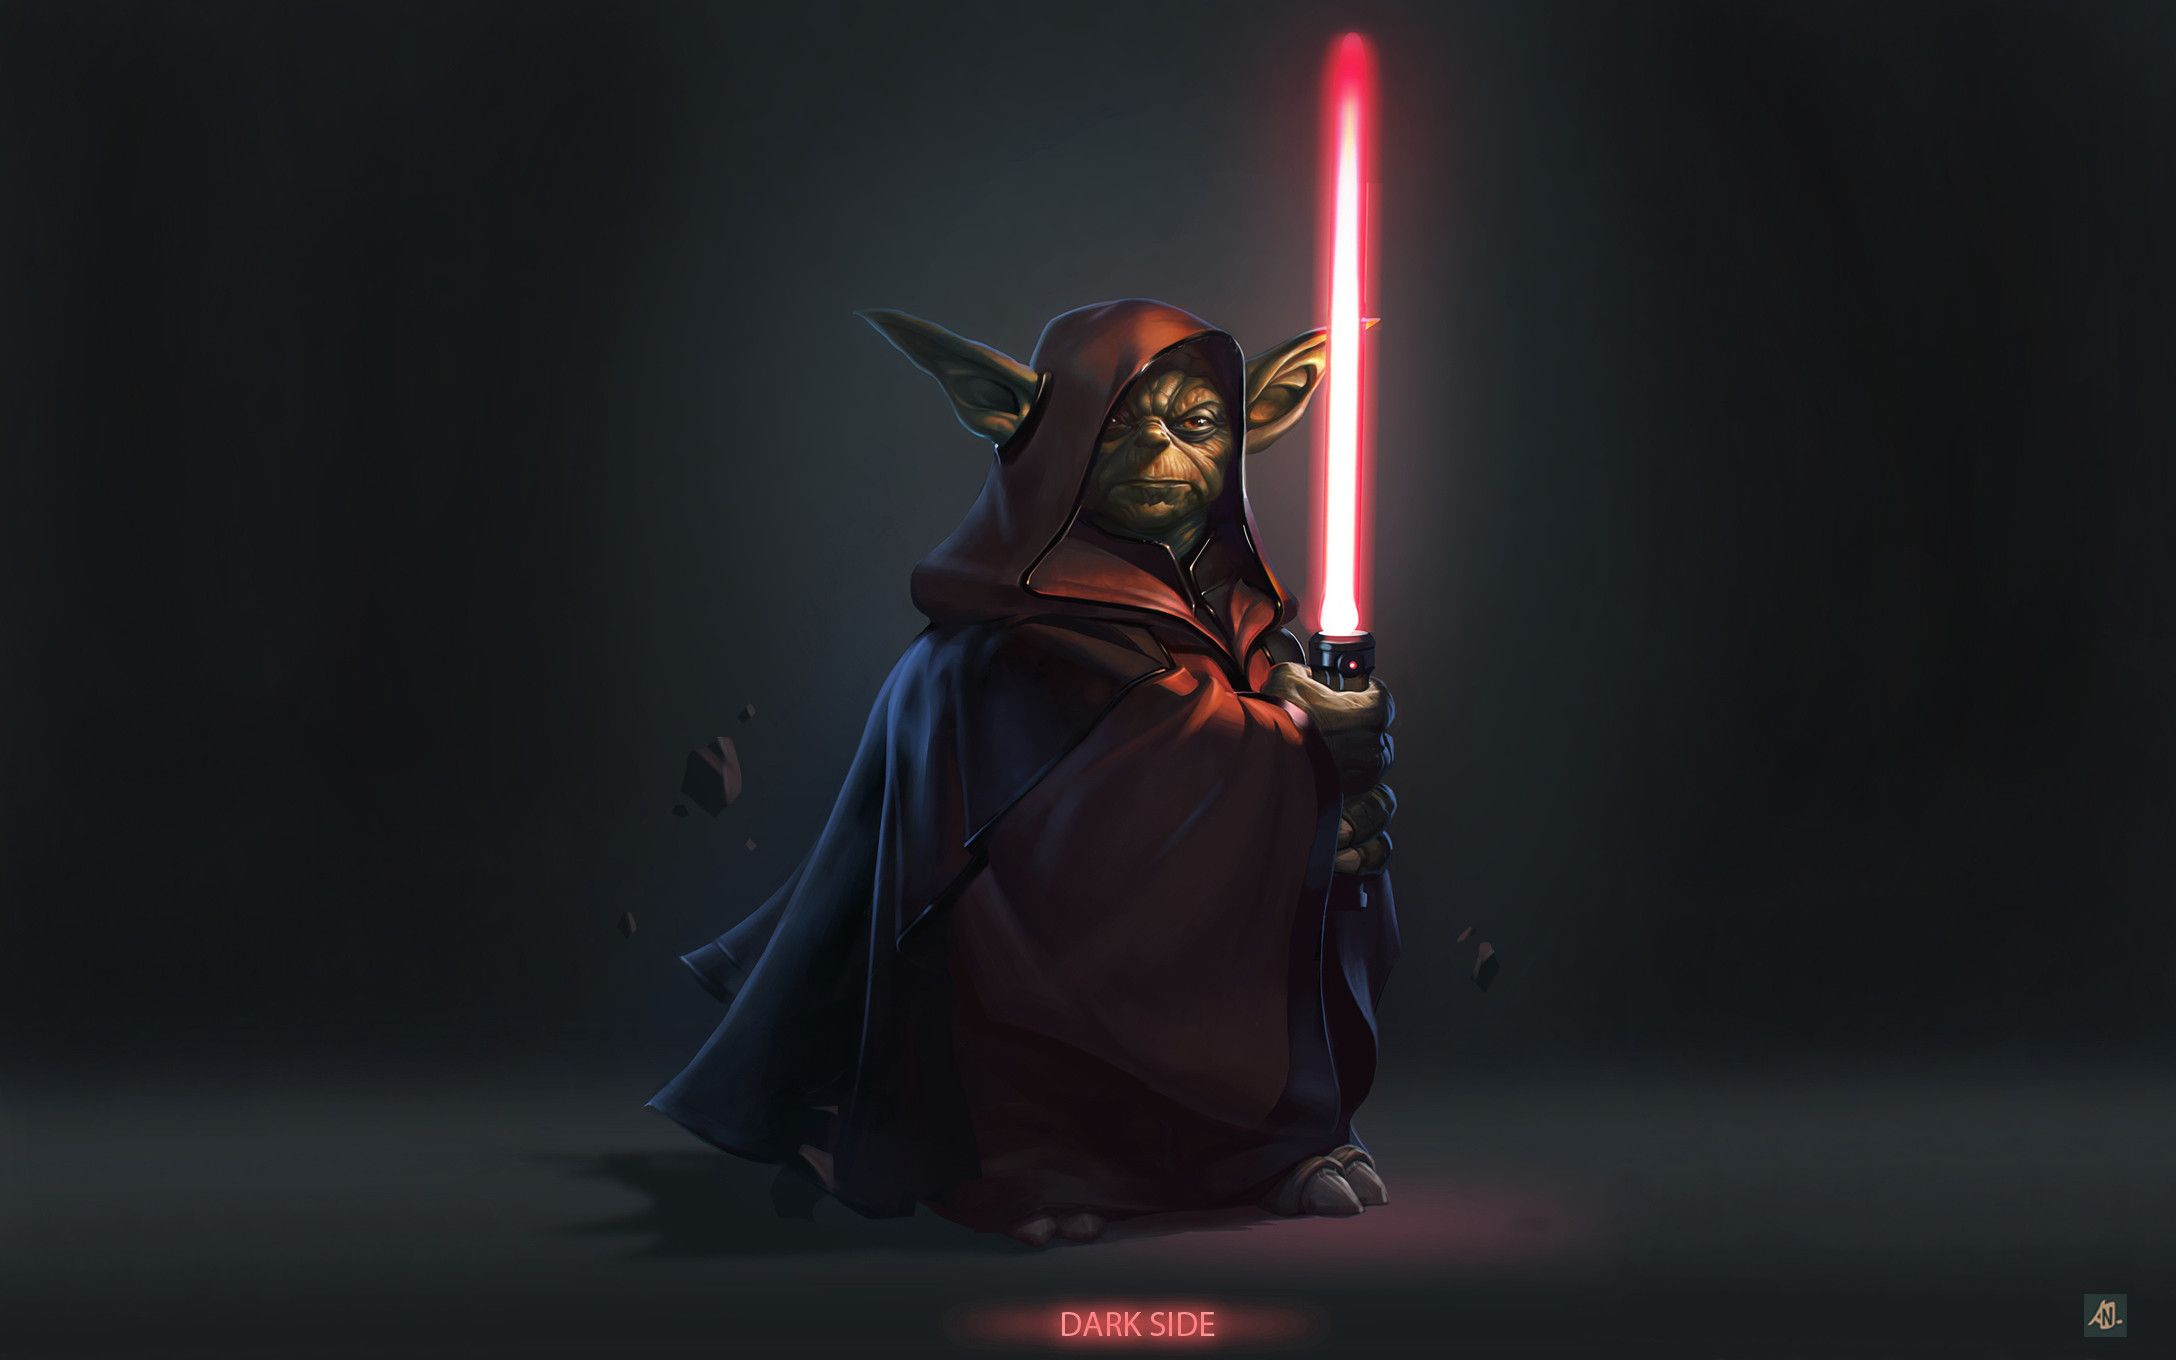 Star Wars Dark Wallpapers Top Free Star Wars Dark Backgrounds Wallpaperaccess